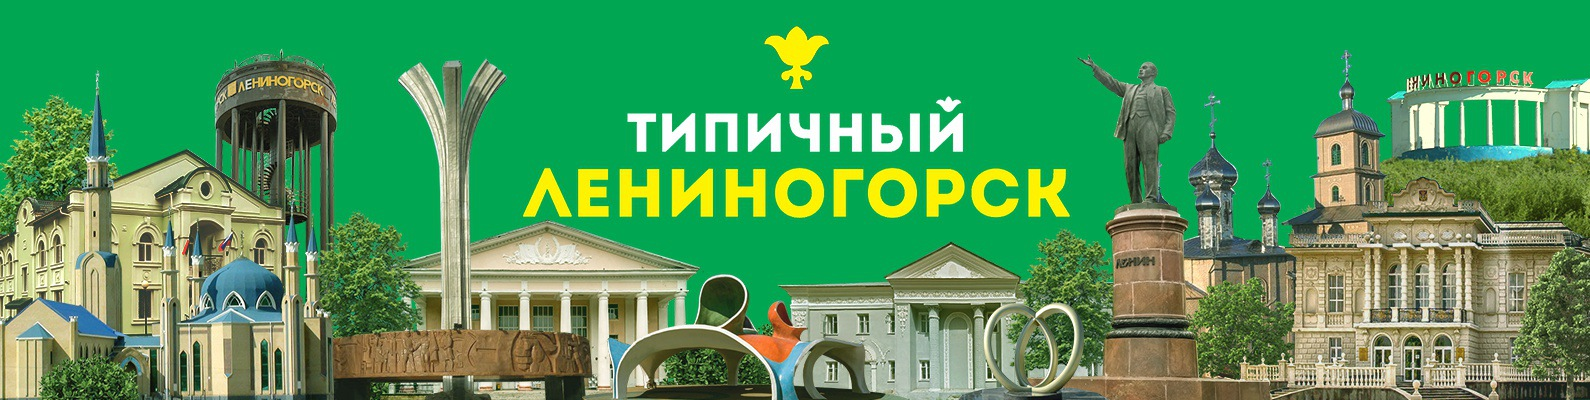 Татарстан лениногорск знакомства доска объявлений усинск знакомства posts